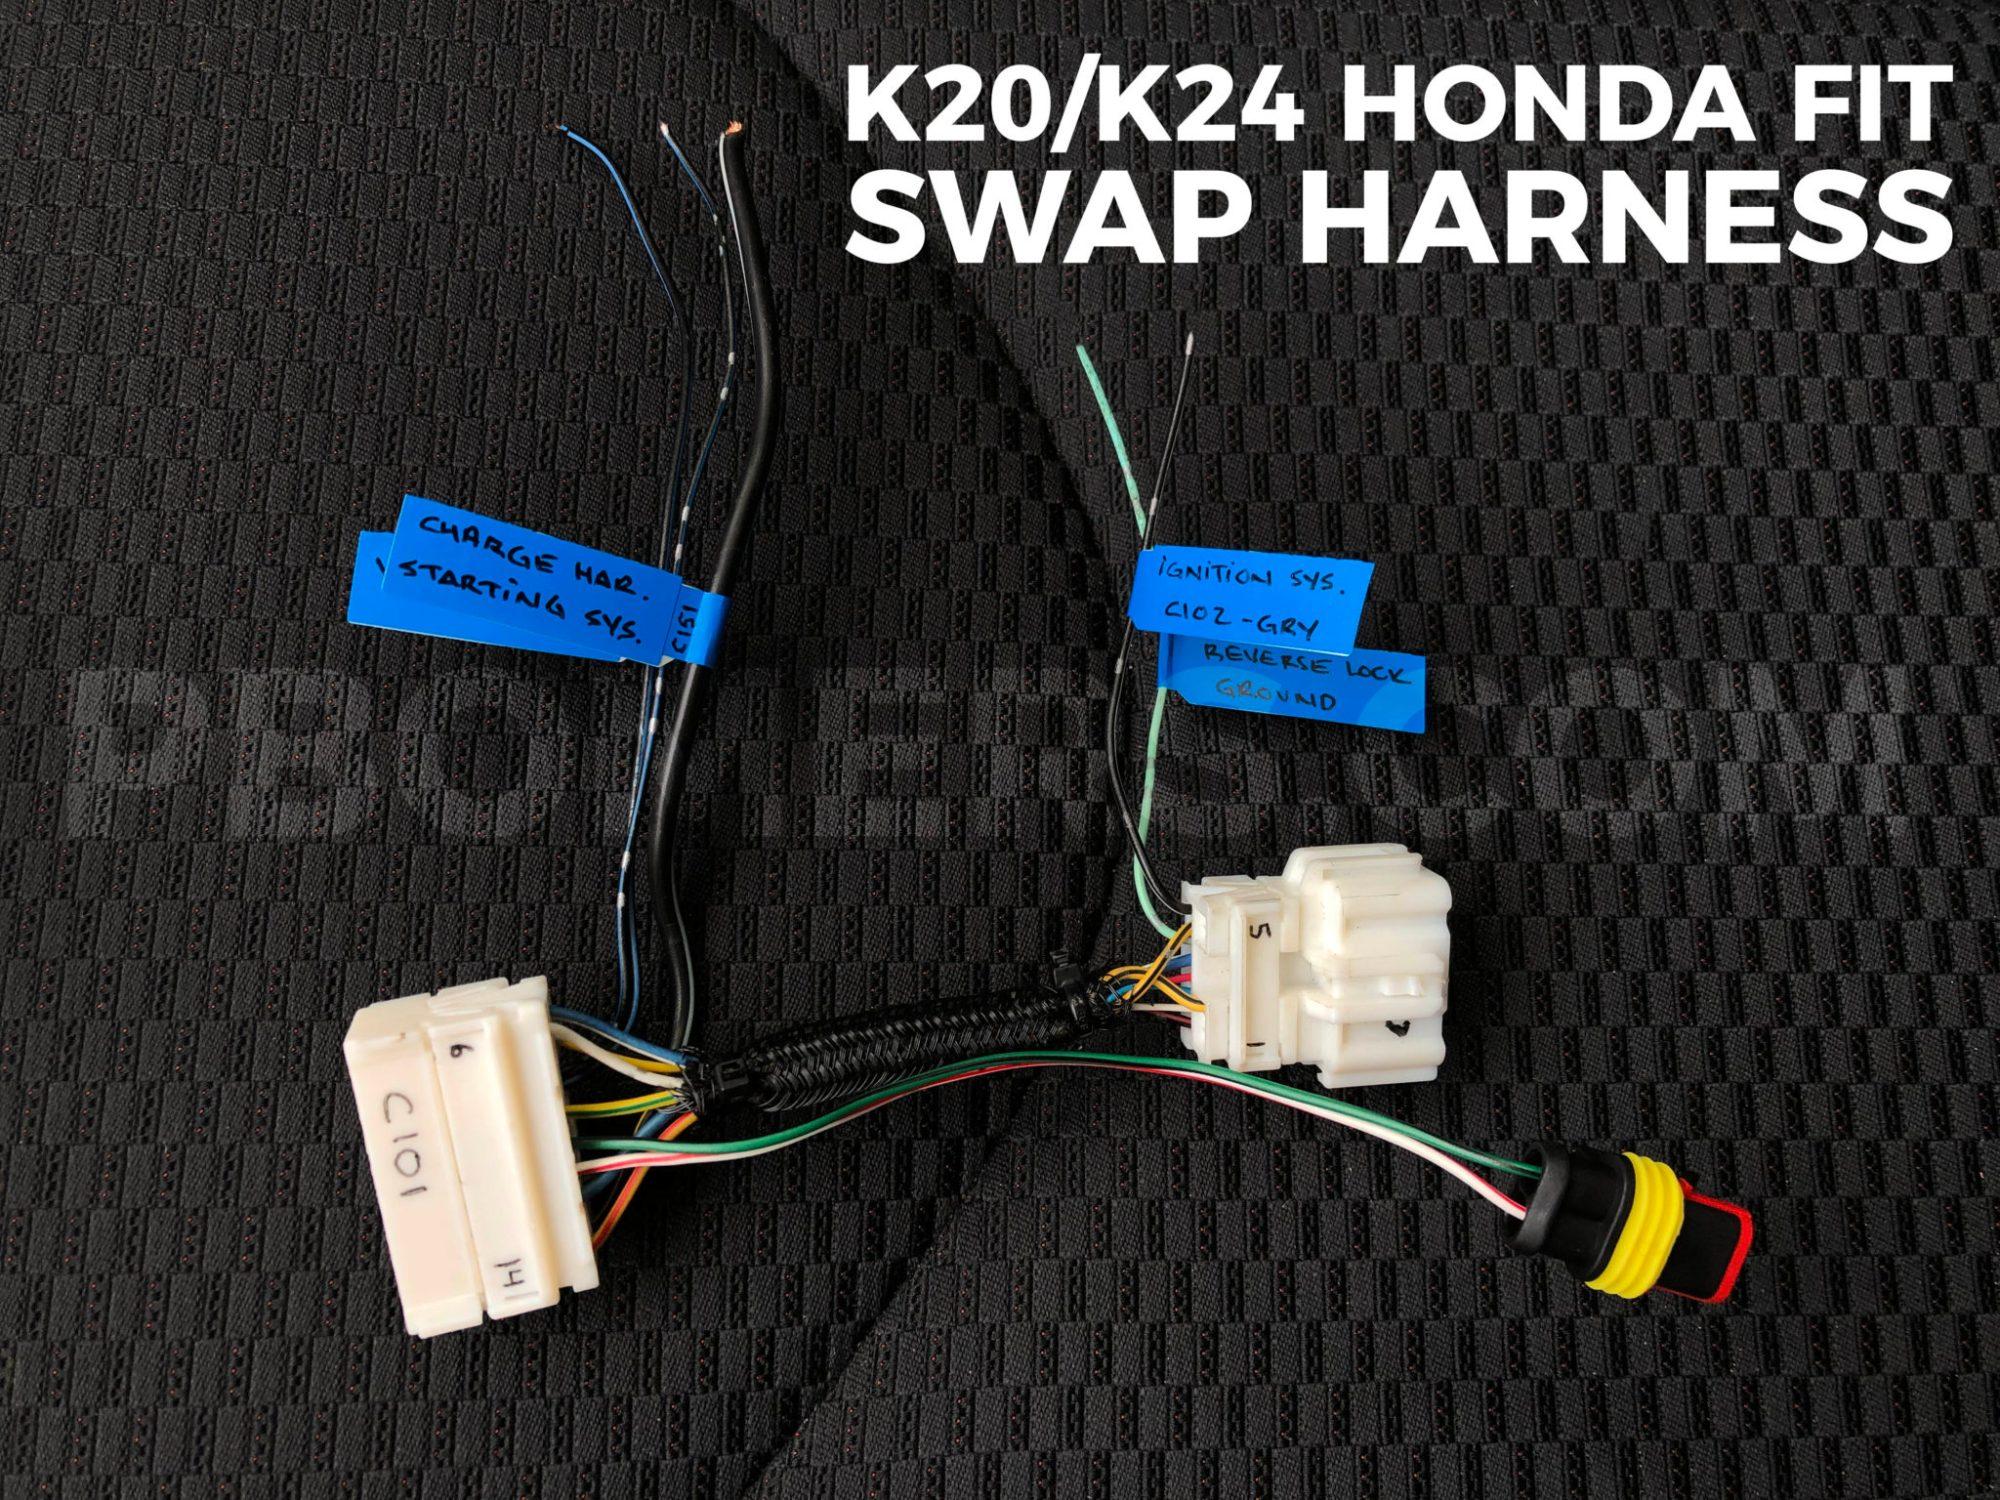 hight resolution of k20 k24 honda fit dash wiring harness